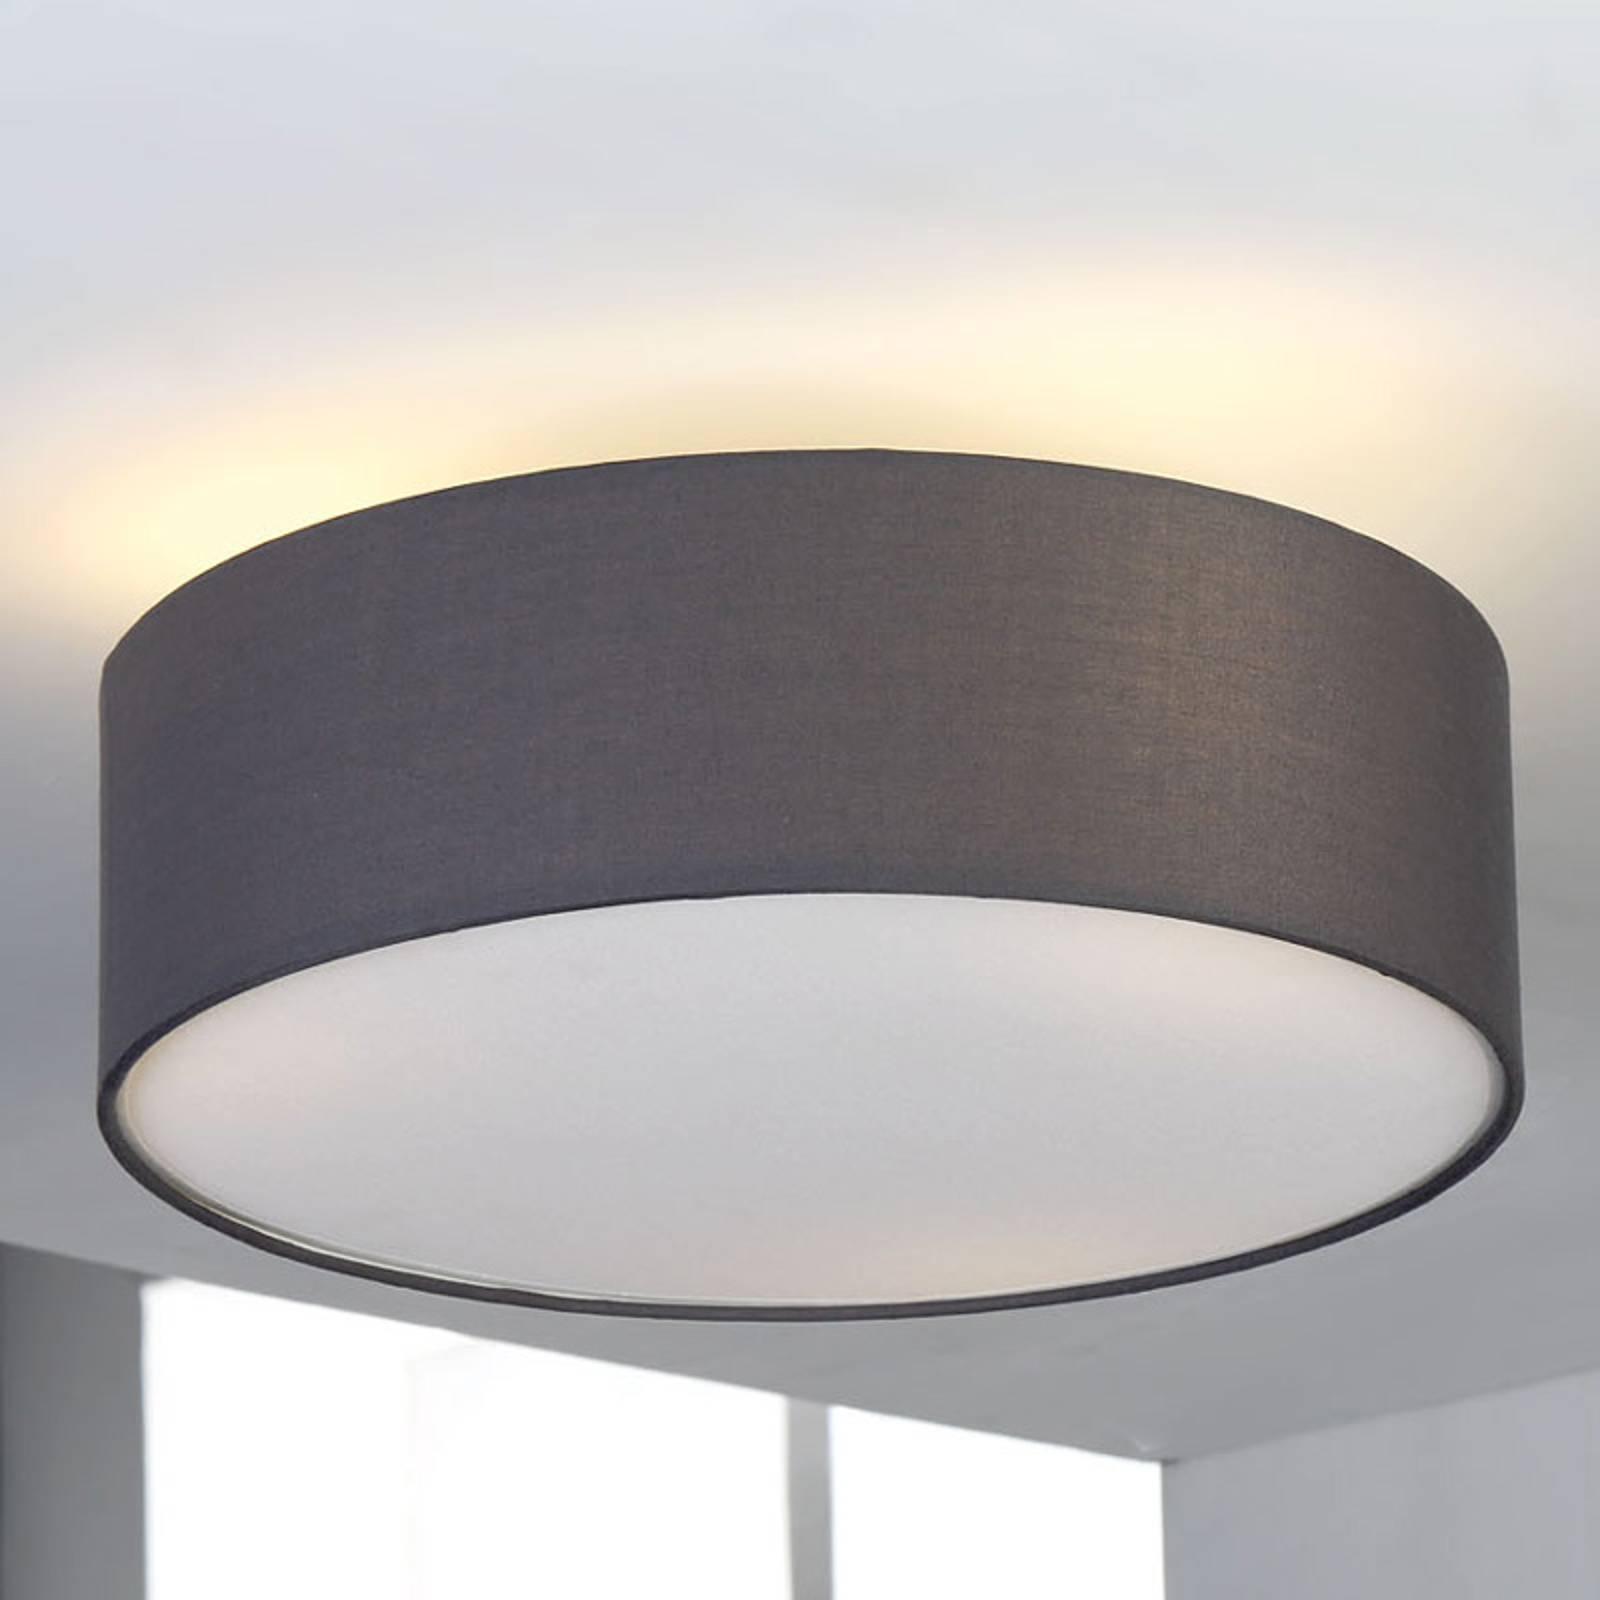 Jasnoszara lampa sufitowa SEBATIN z materiału